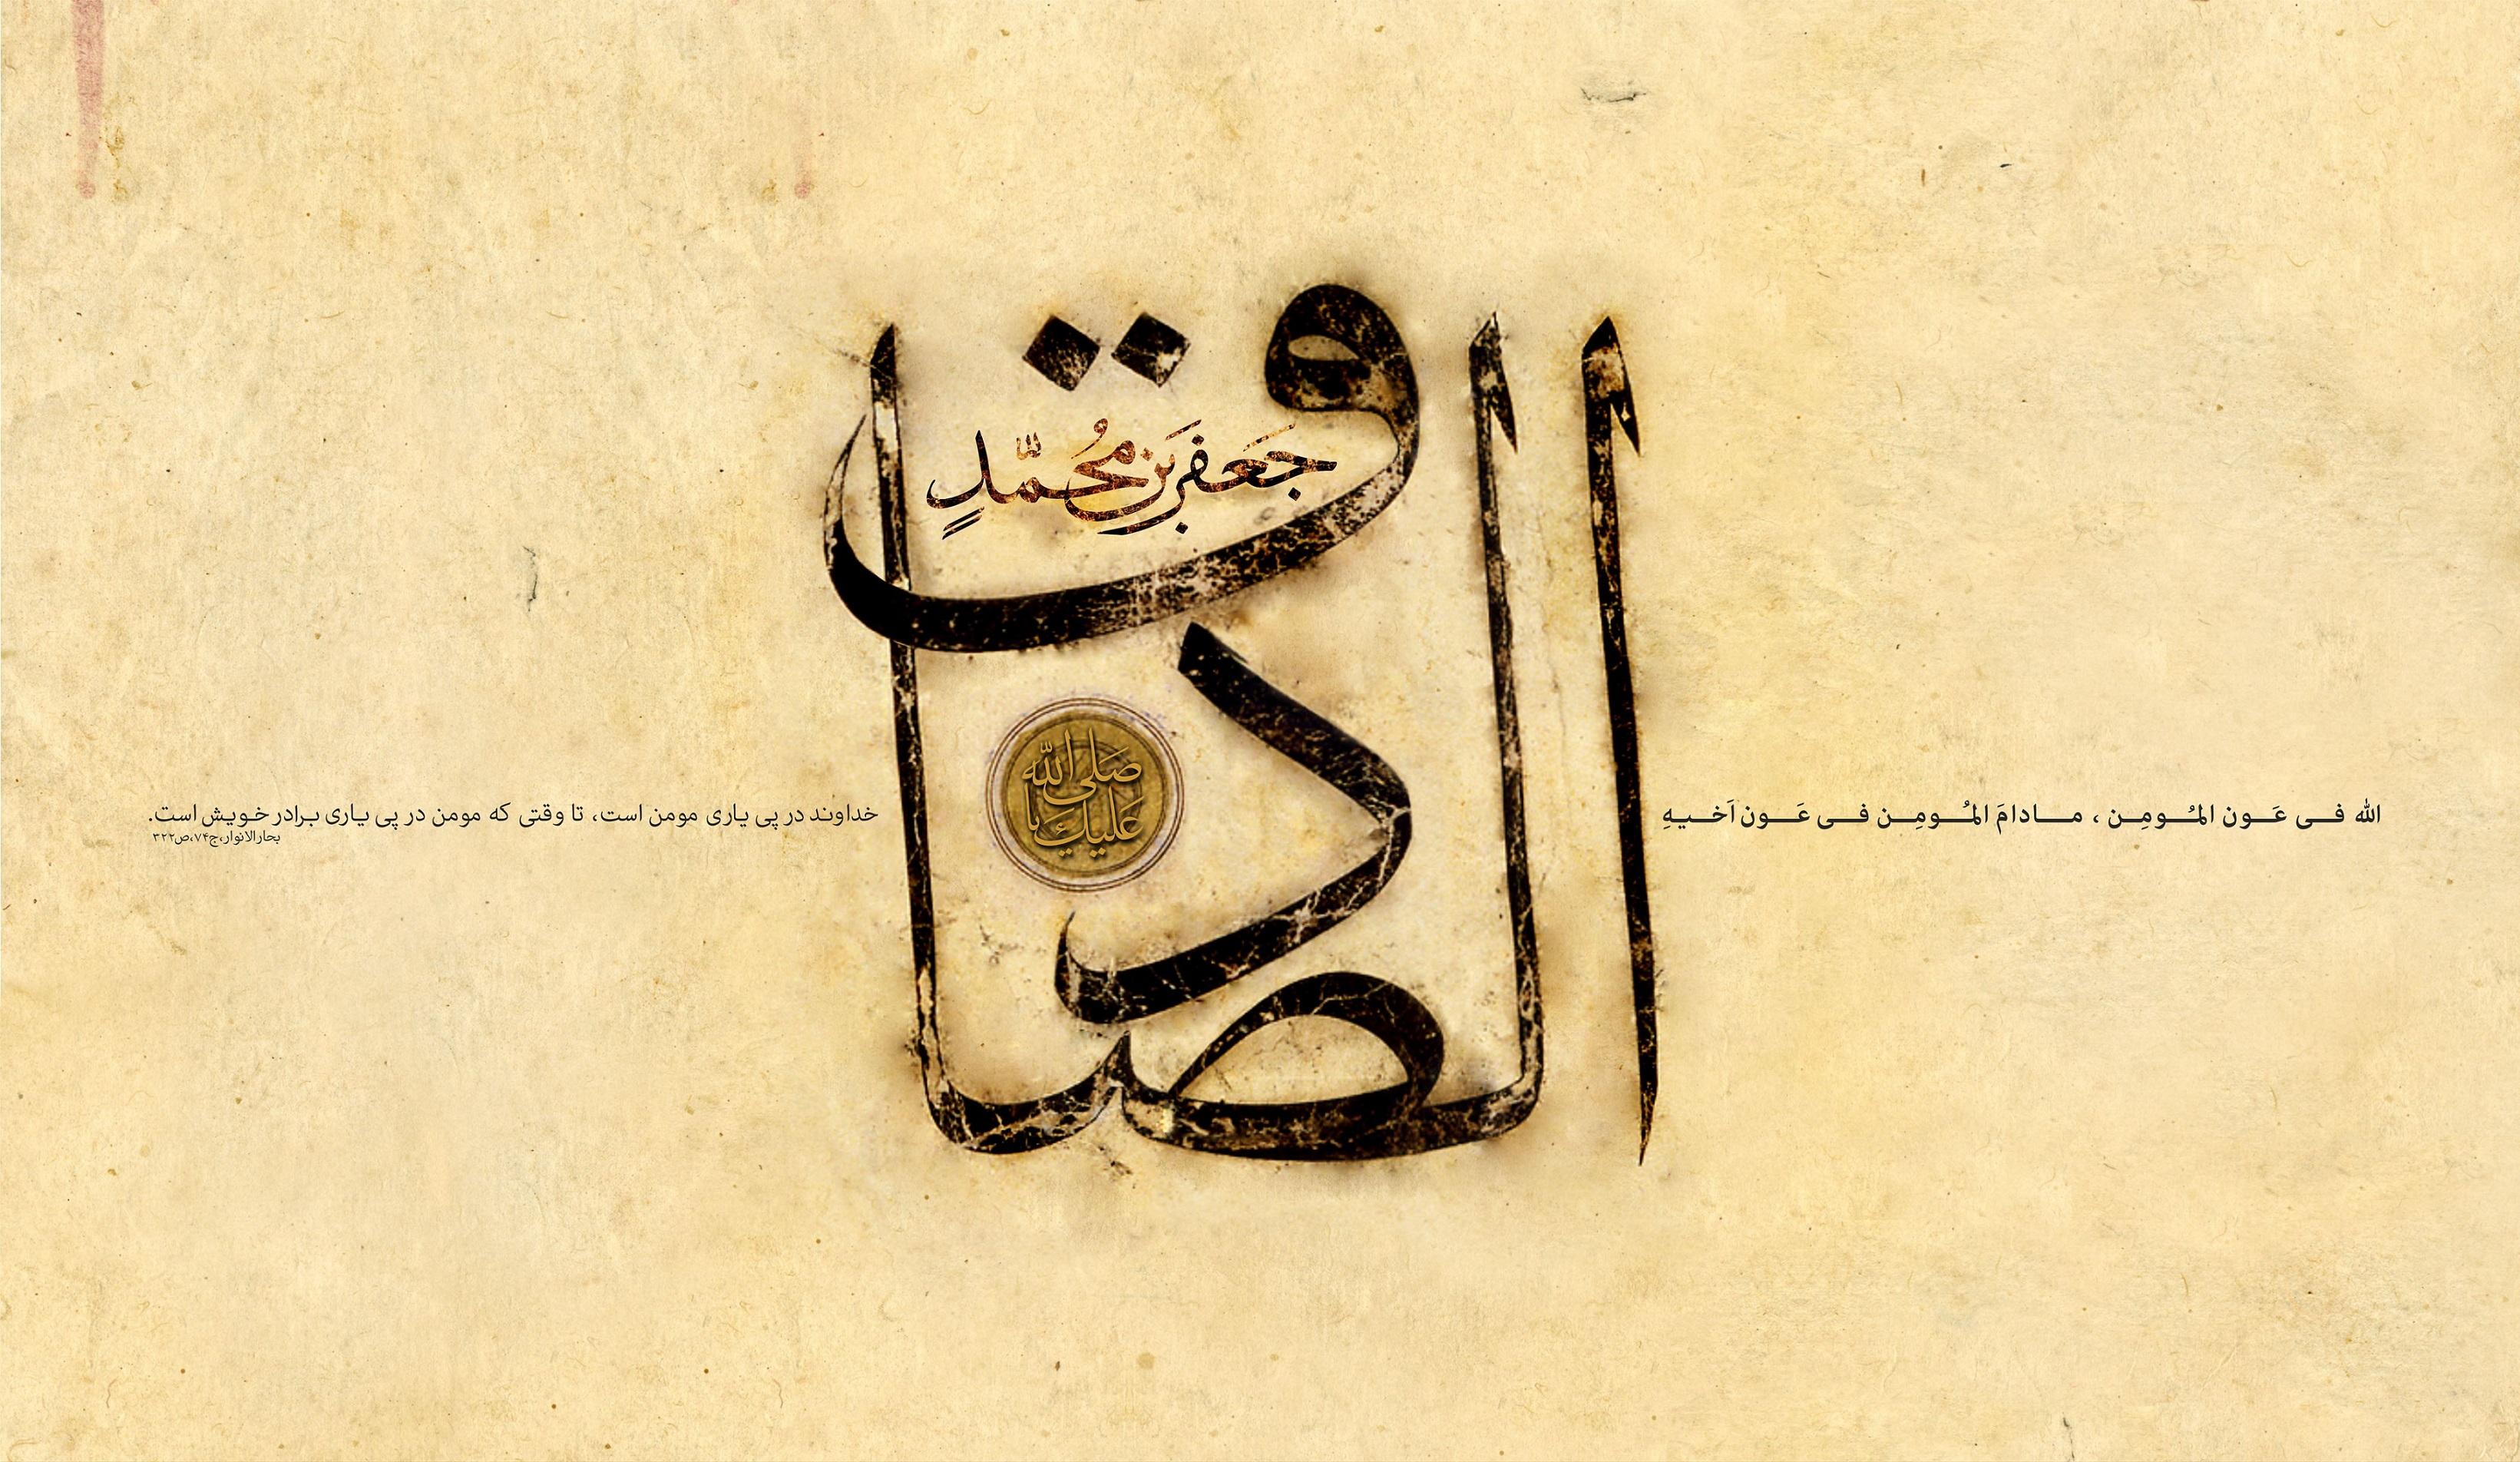 اس ام اس شهادت امام صادق (ع)